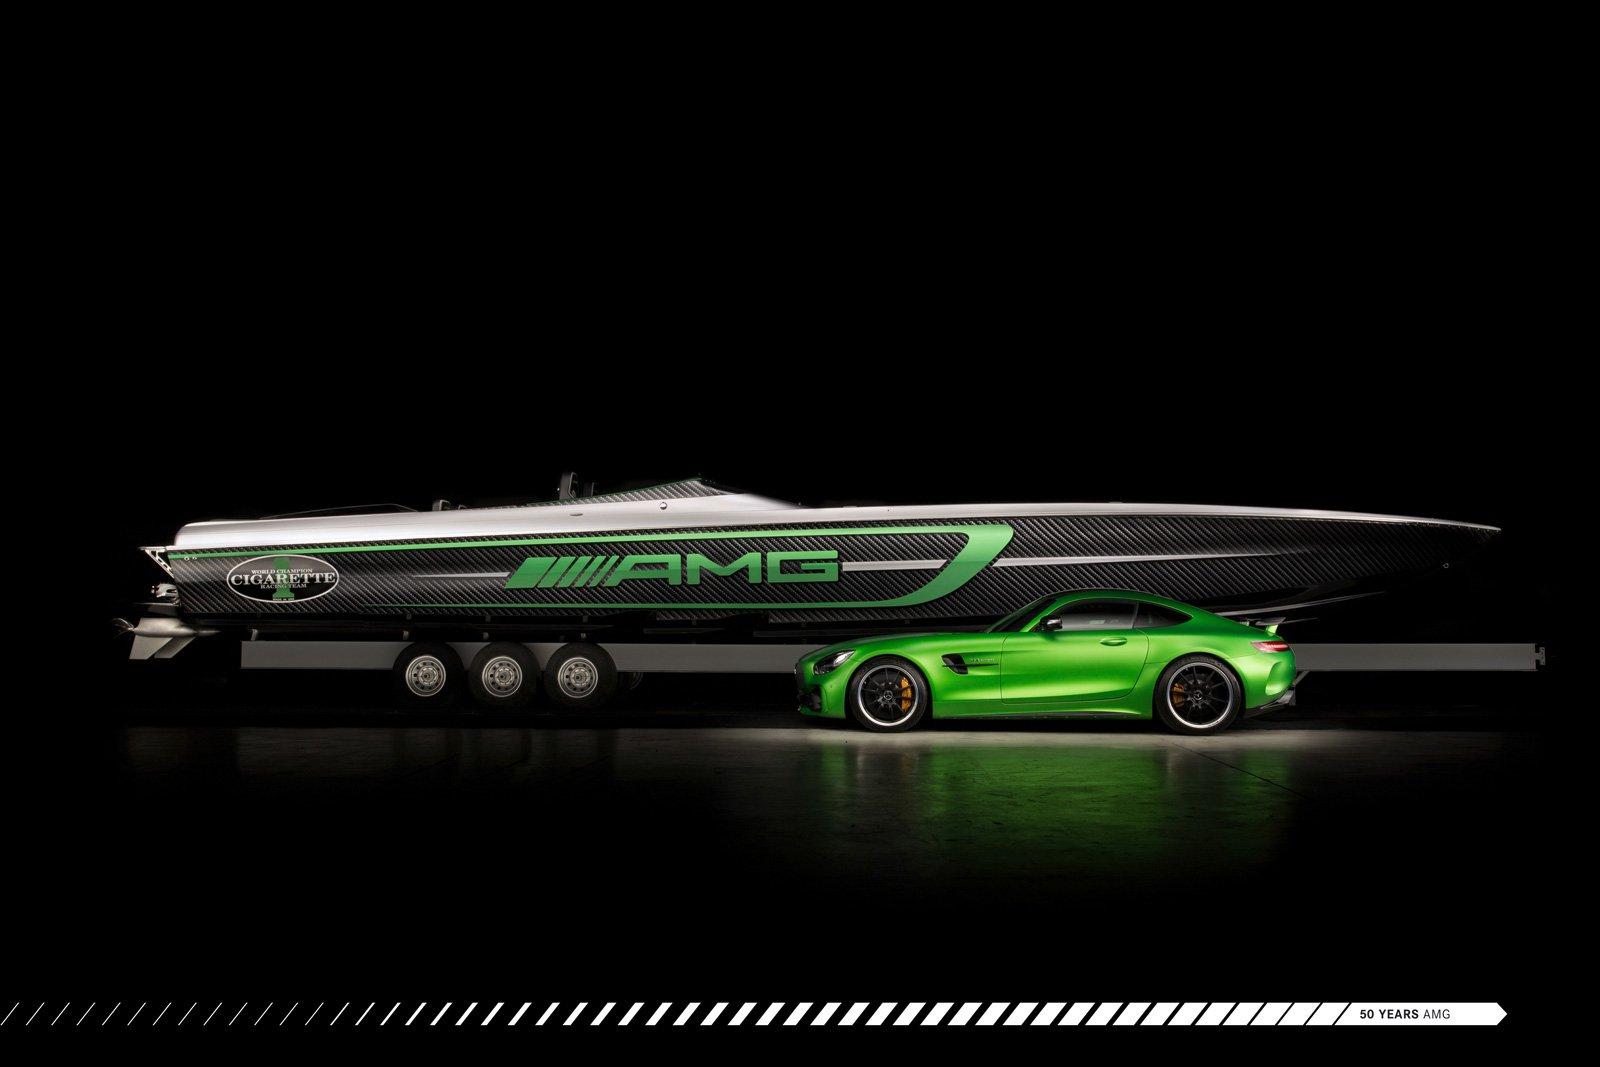 cigarette-racing-team-50-marauder-amg-boat-02